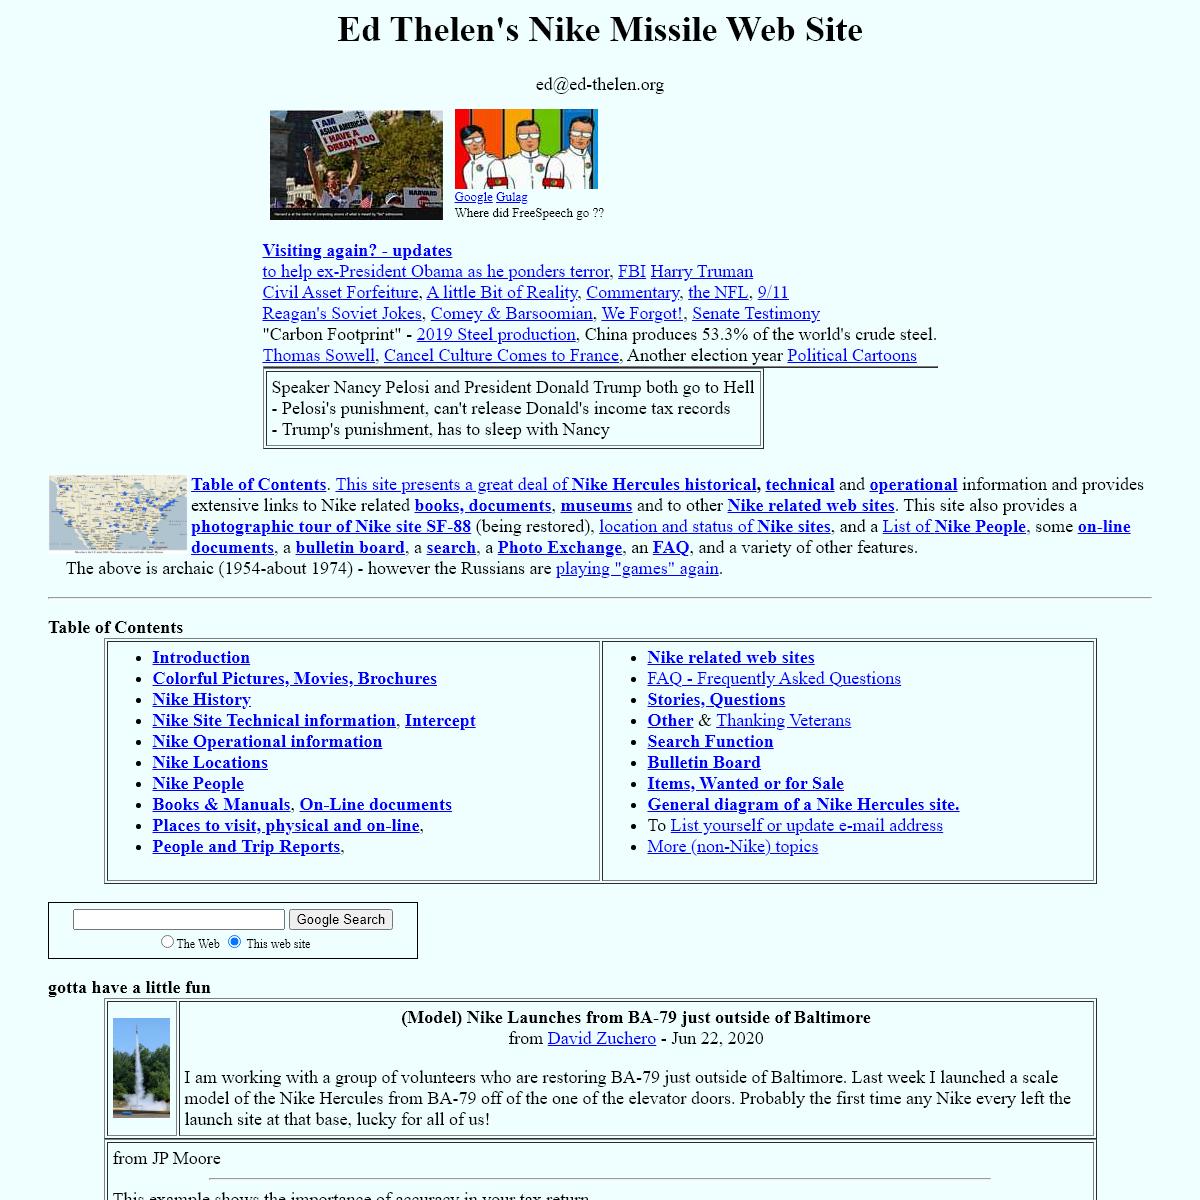 Ed`s Nike Missile Web Site